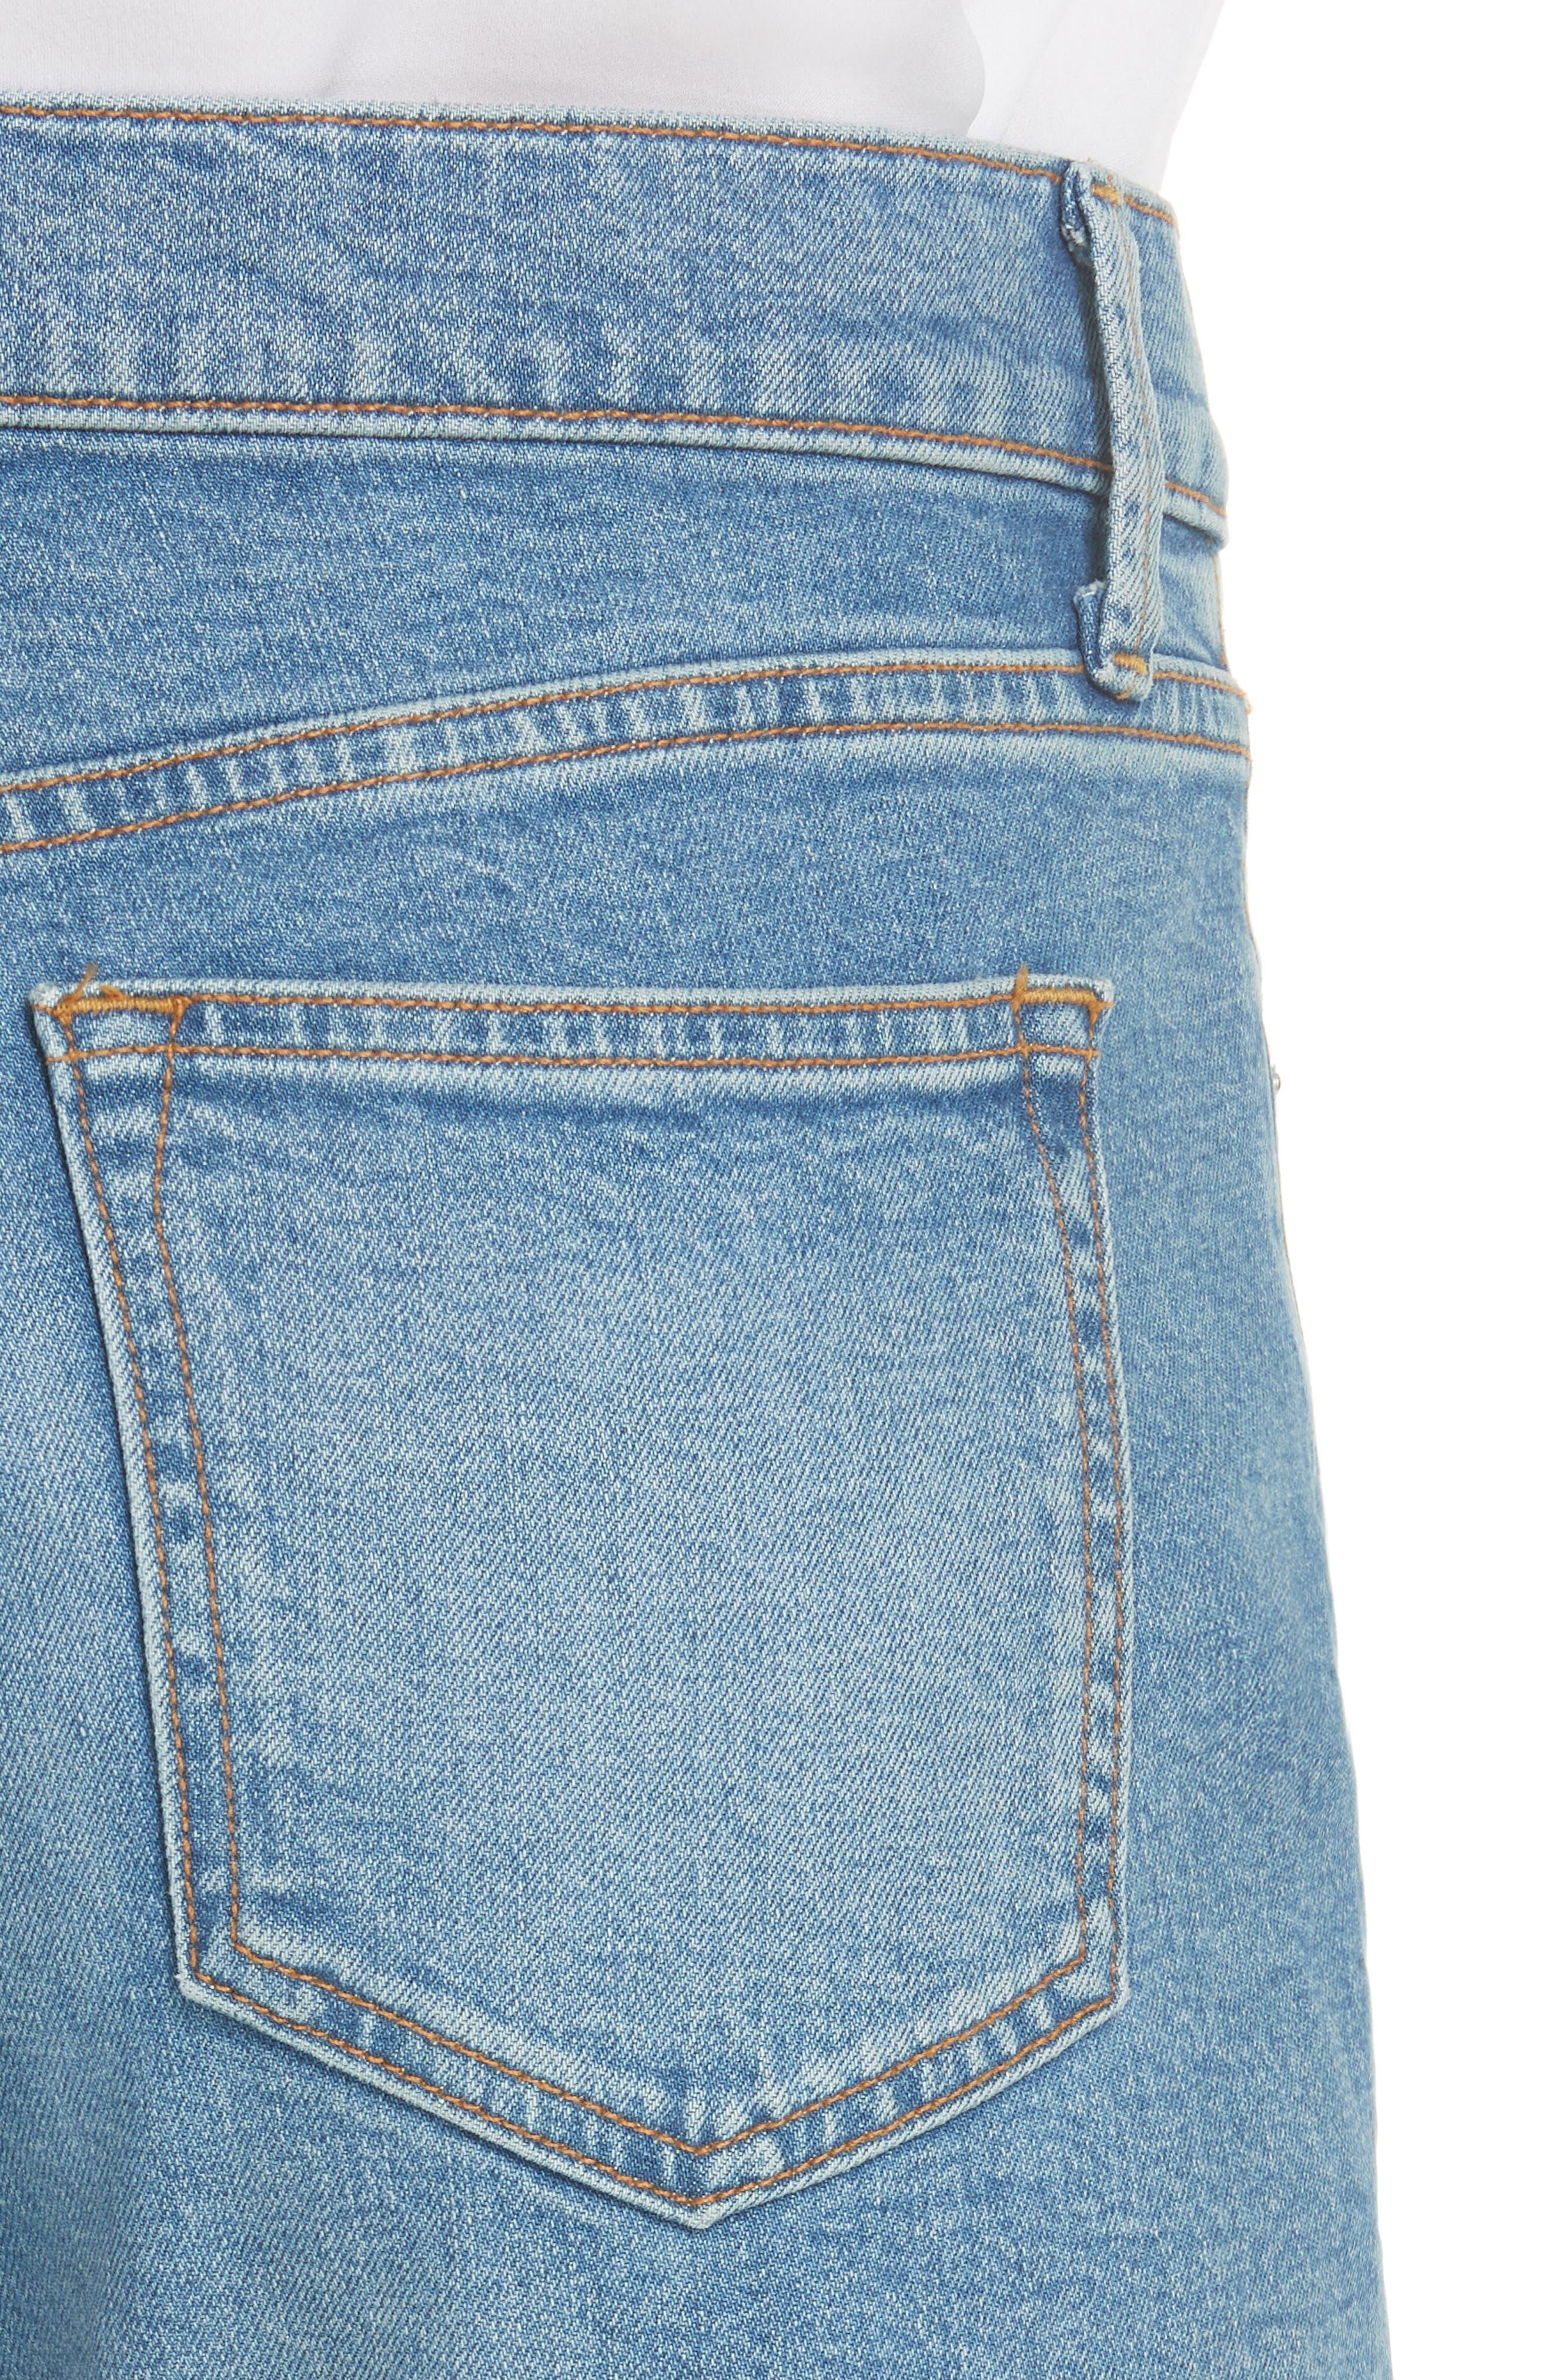 5-Pocket Skinny Jeans,                             Alternate thumbnail 4, color,                             LIGHT WASH